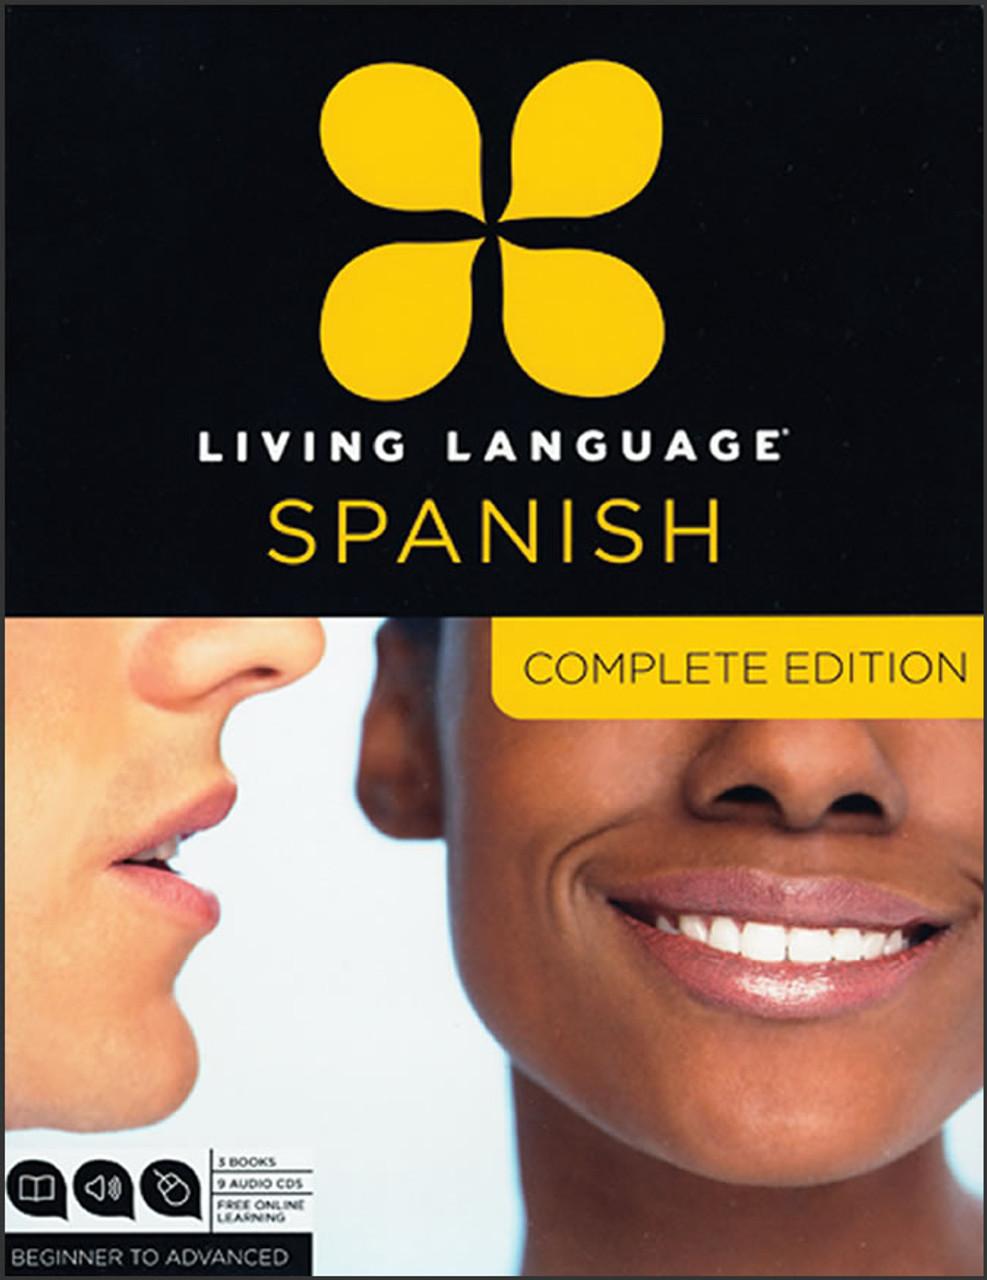 Living Language Spanish: Complete Edition